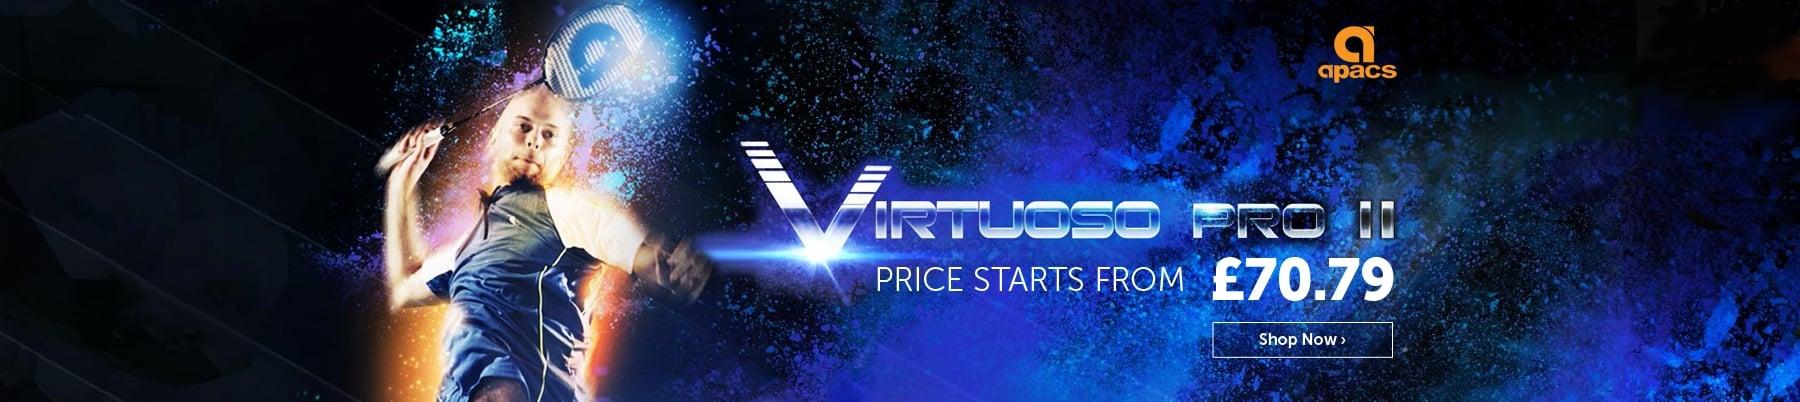 Virtuoso Pro